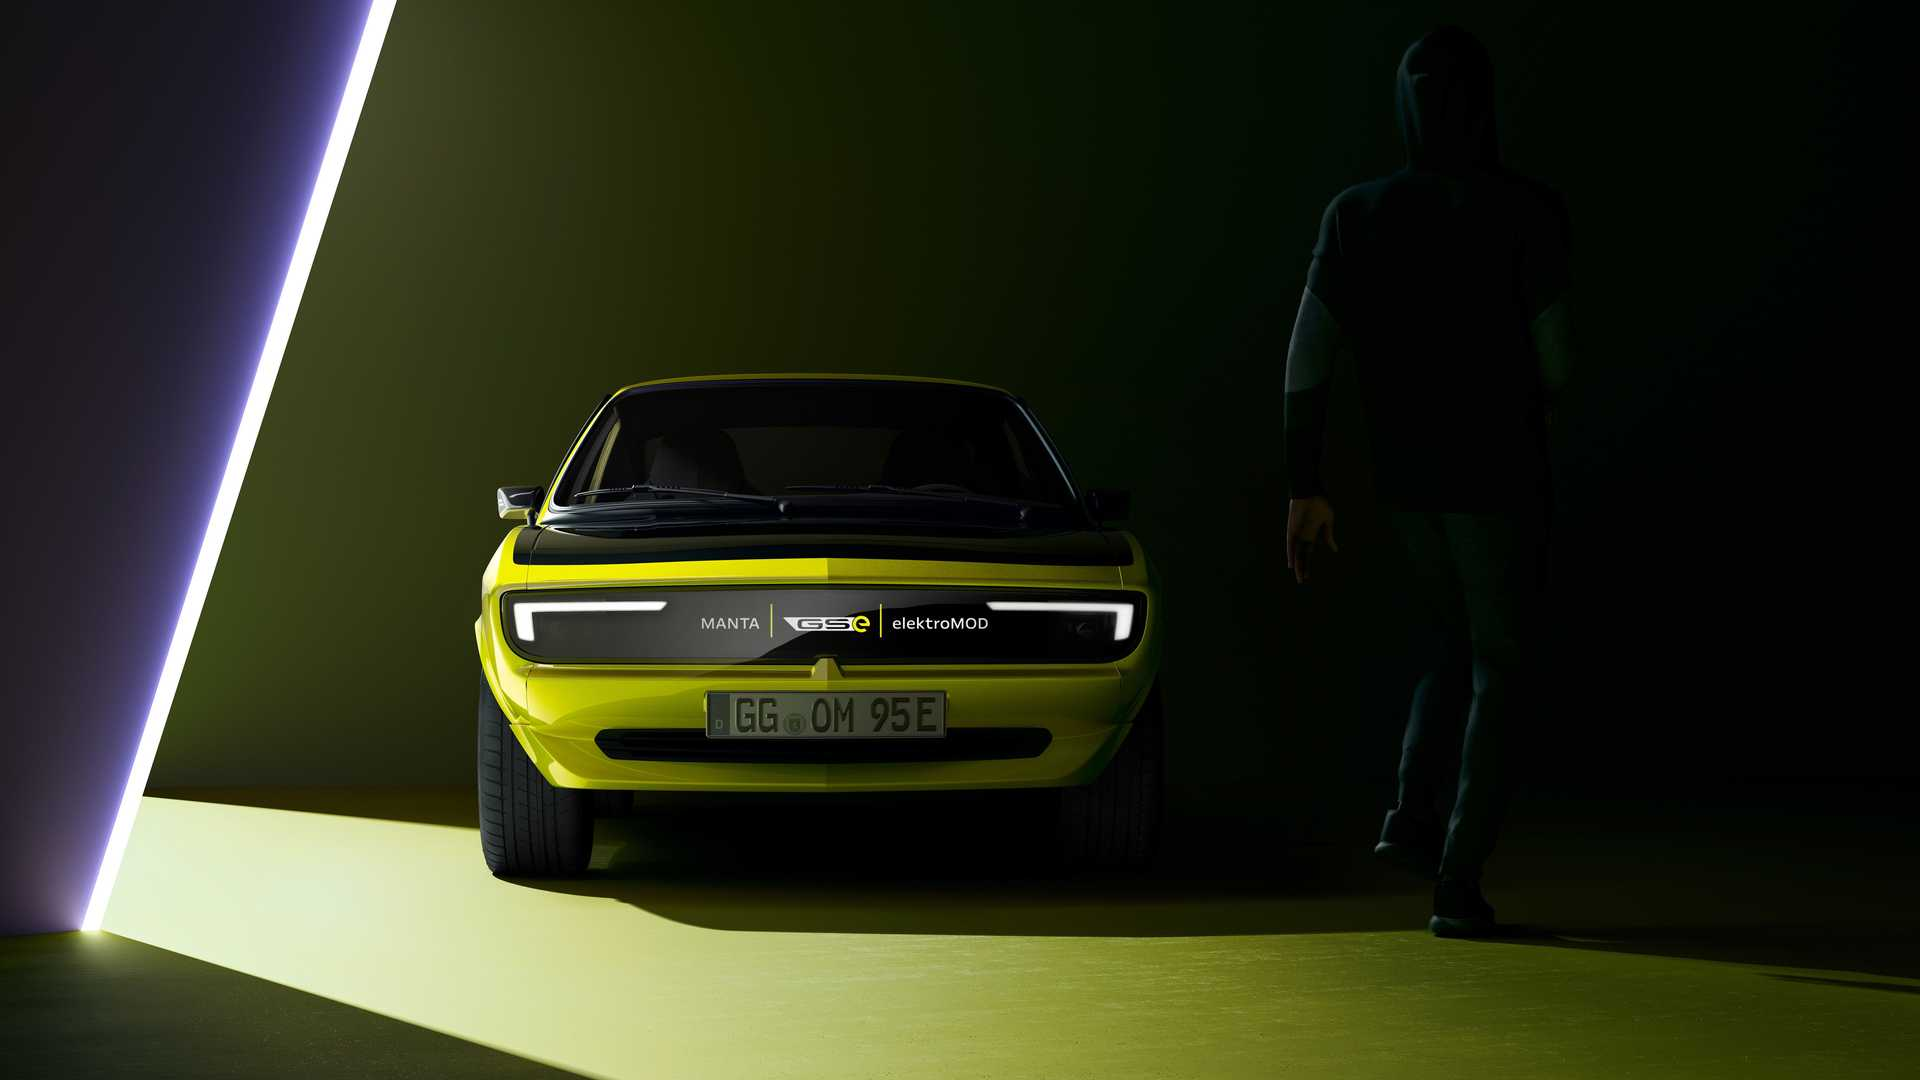 Opel-Manta-GSe-ElektroMOD-30